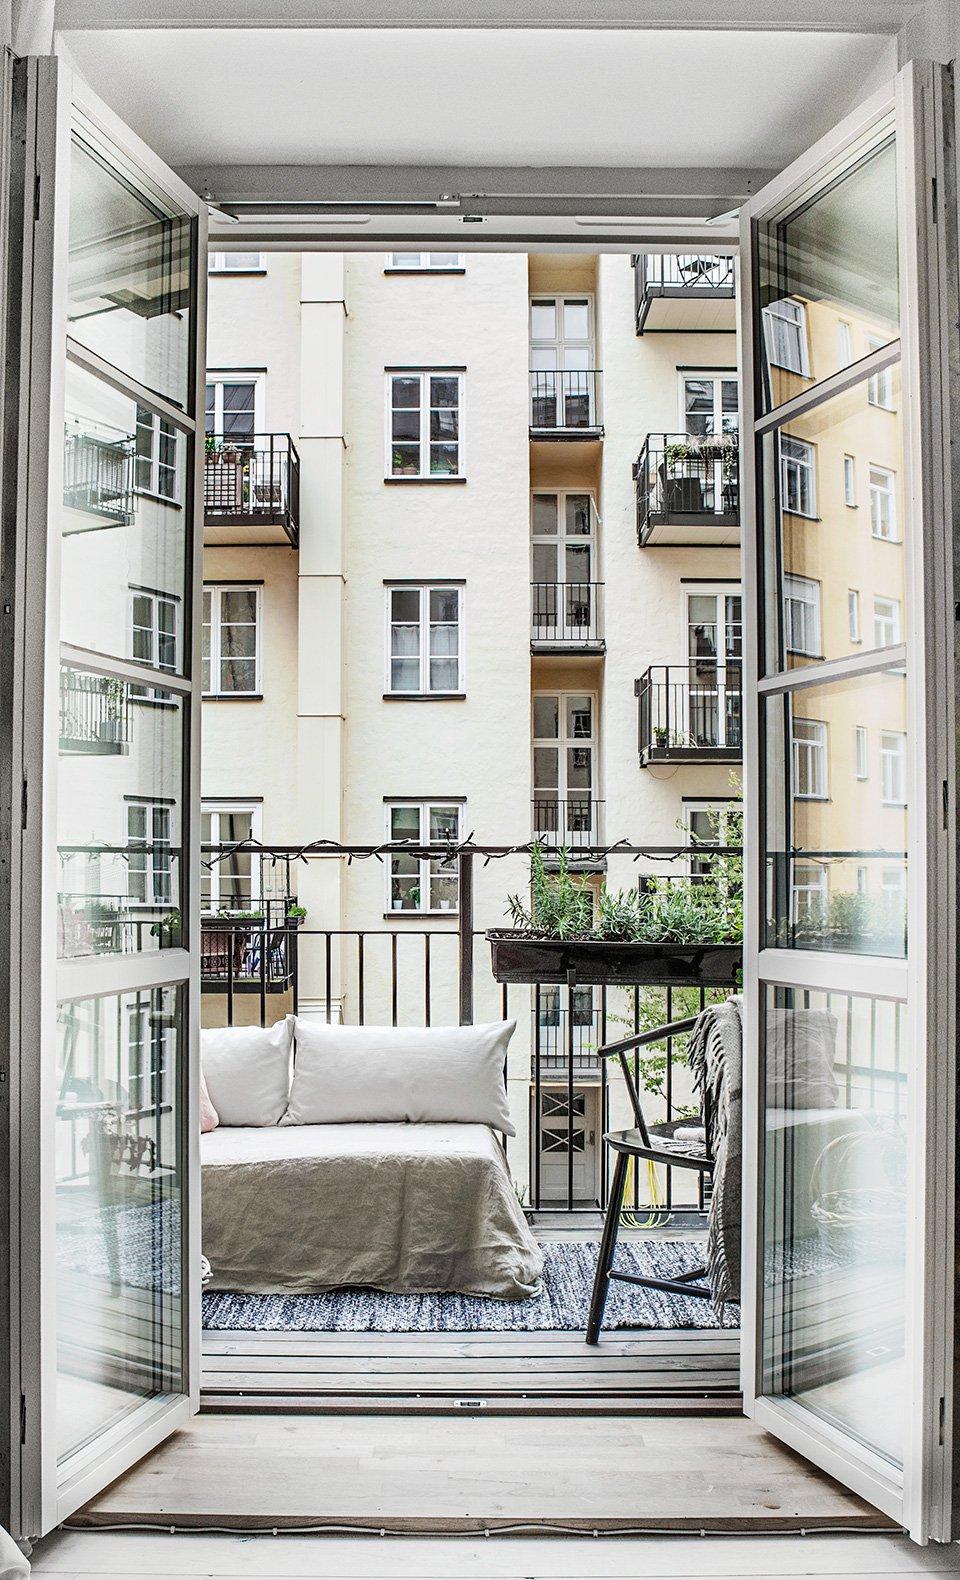 thatscandinavianfeeling cosy balcony scandinavian hygge 13